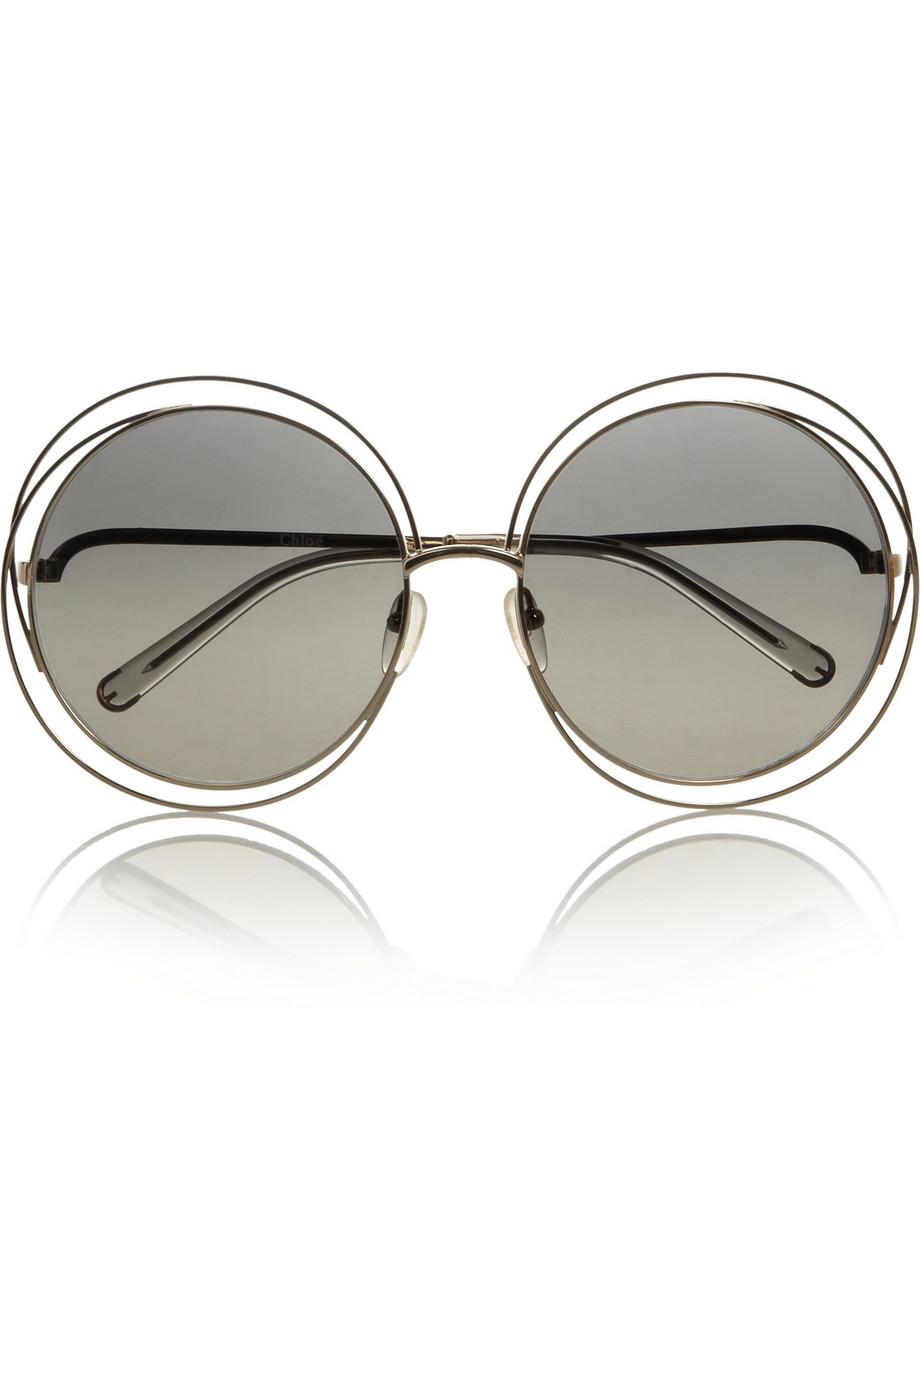 Chloe Gold Frame Sunglasses : Chloe Carlina Roundframe Metal Sunglasses in Gray Lyst